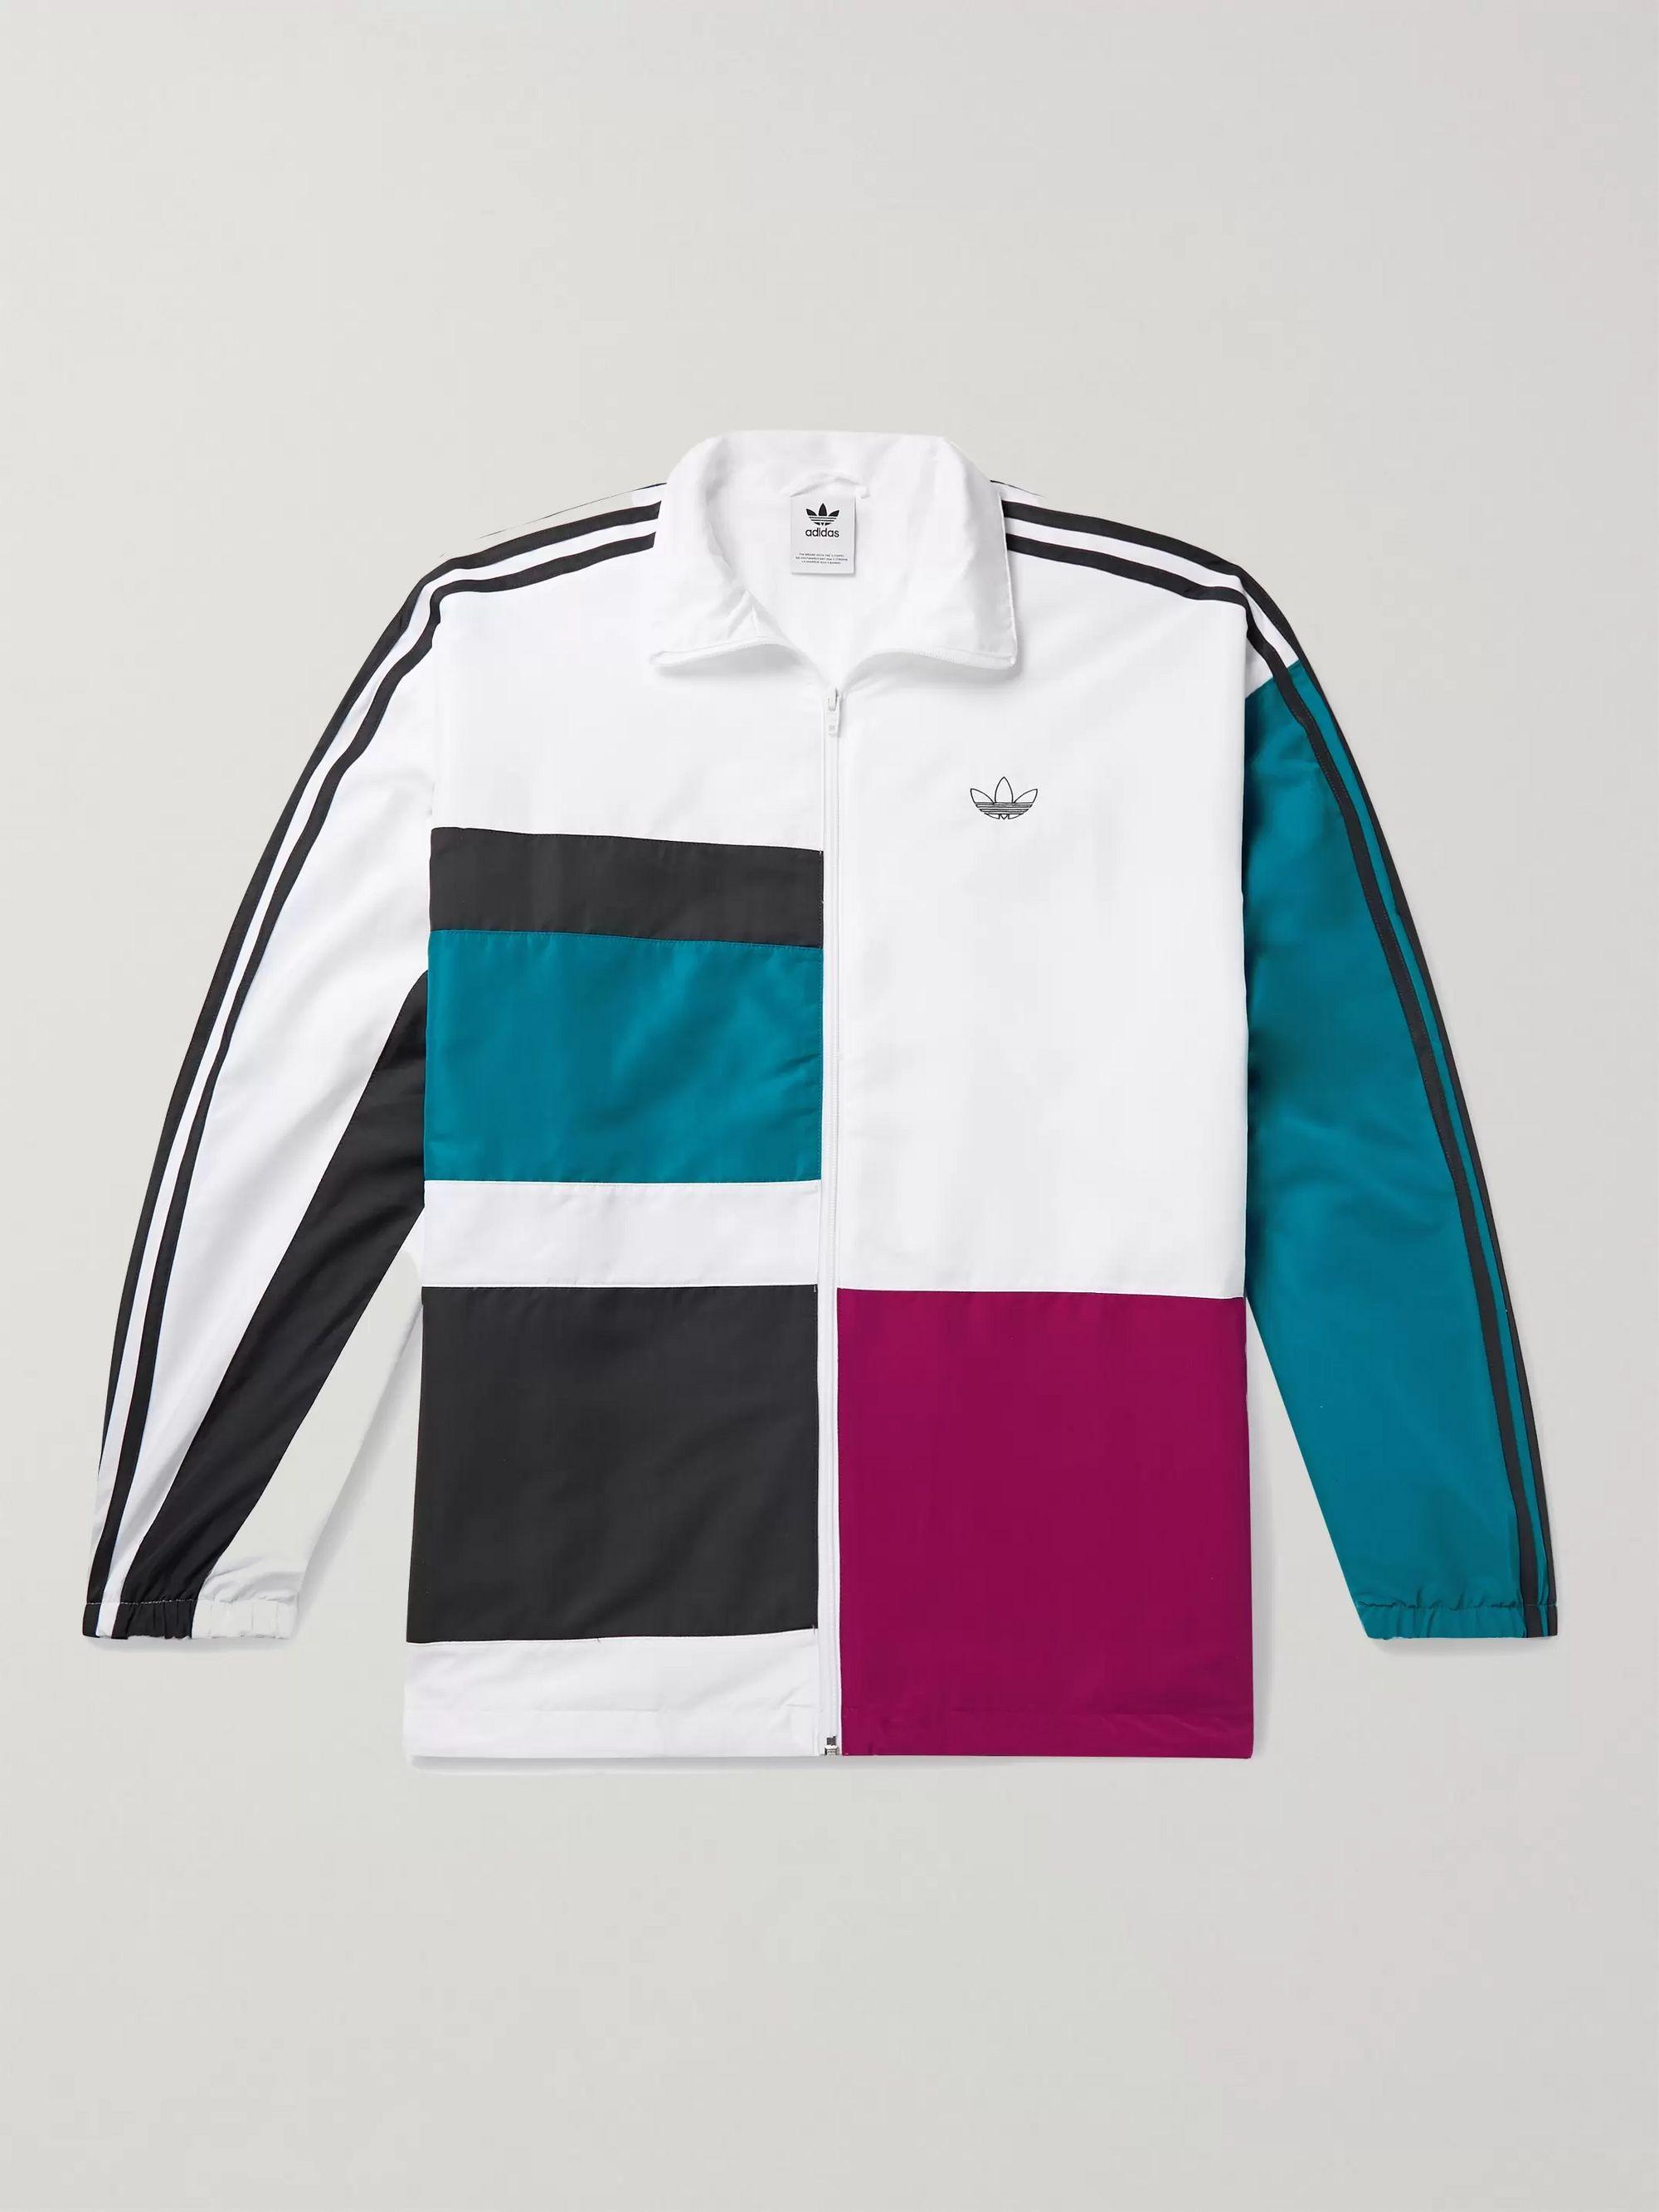 adidas shirt design your own